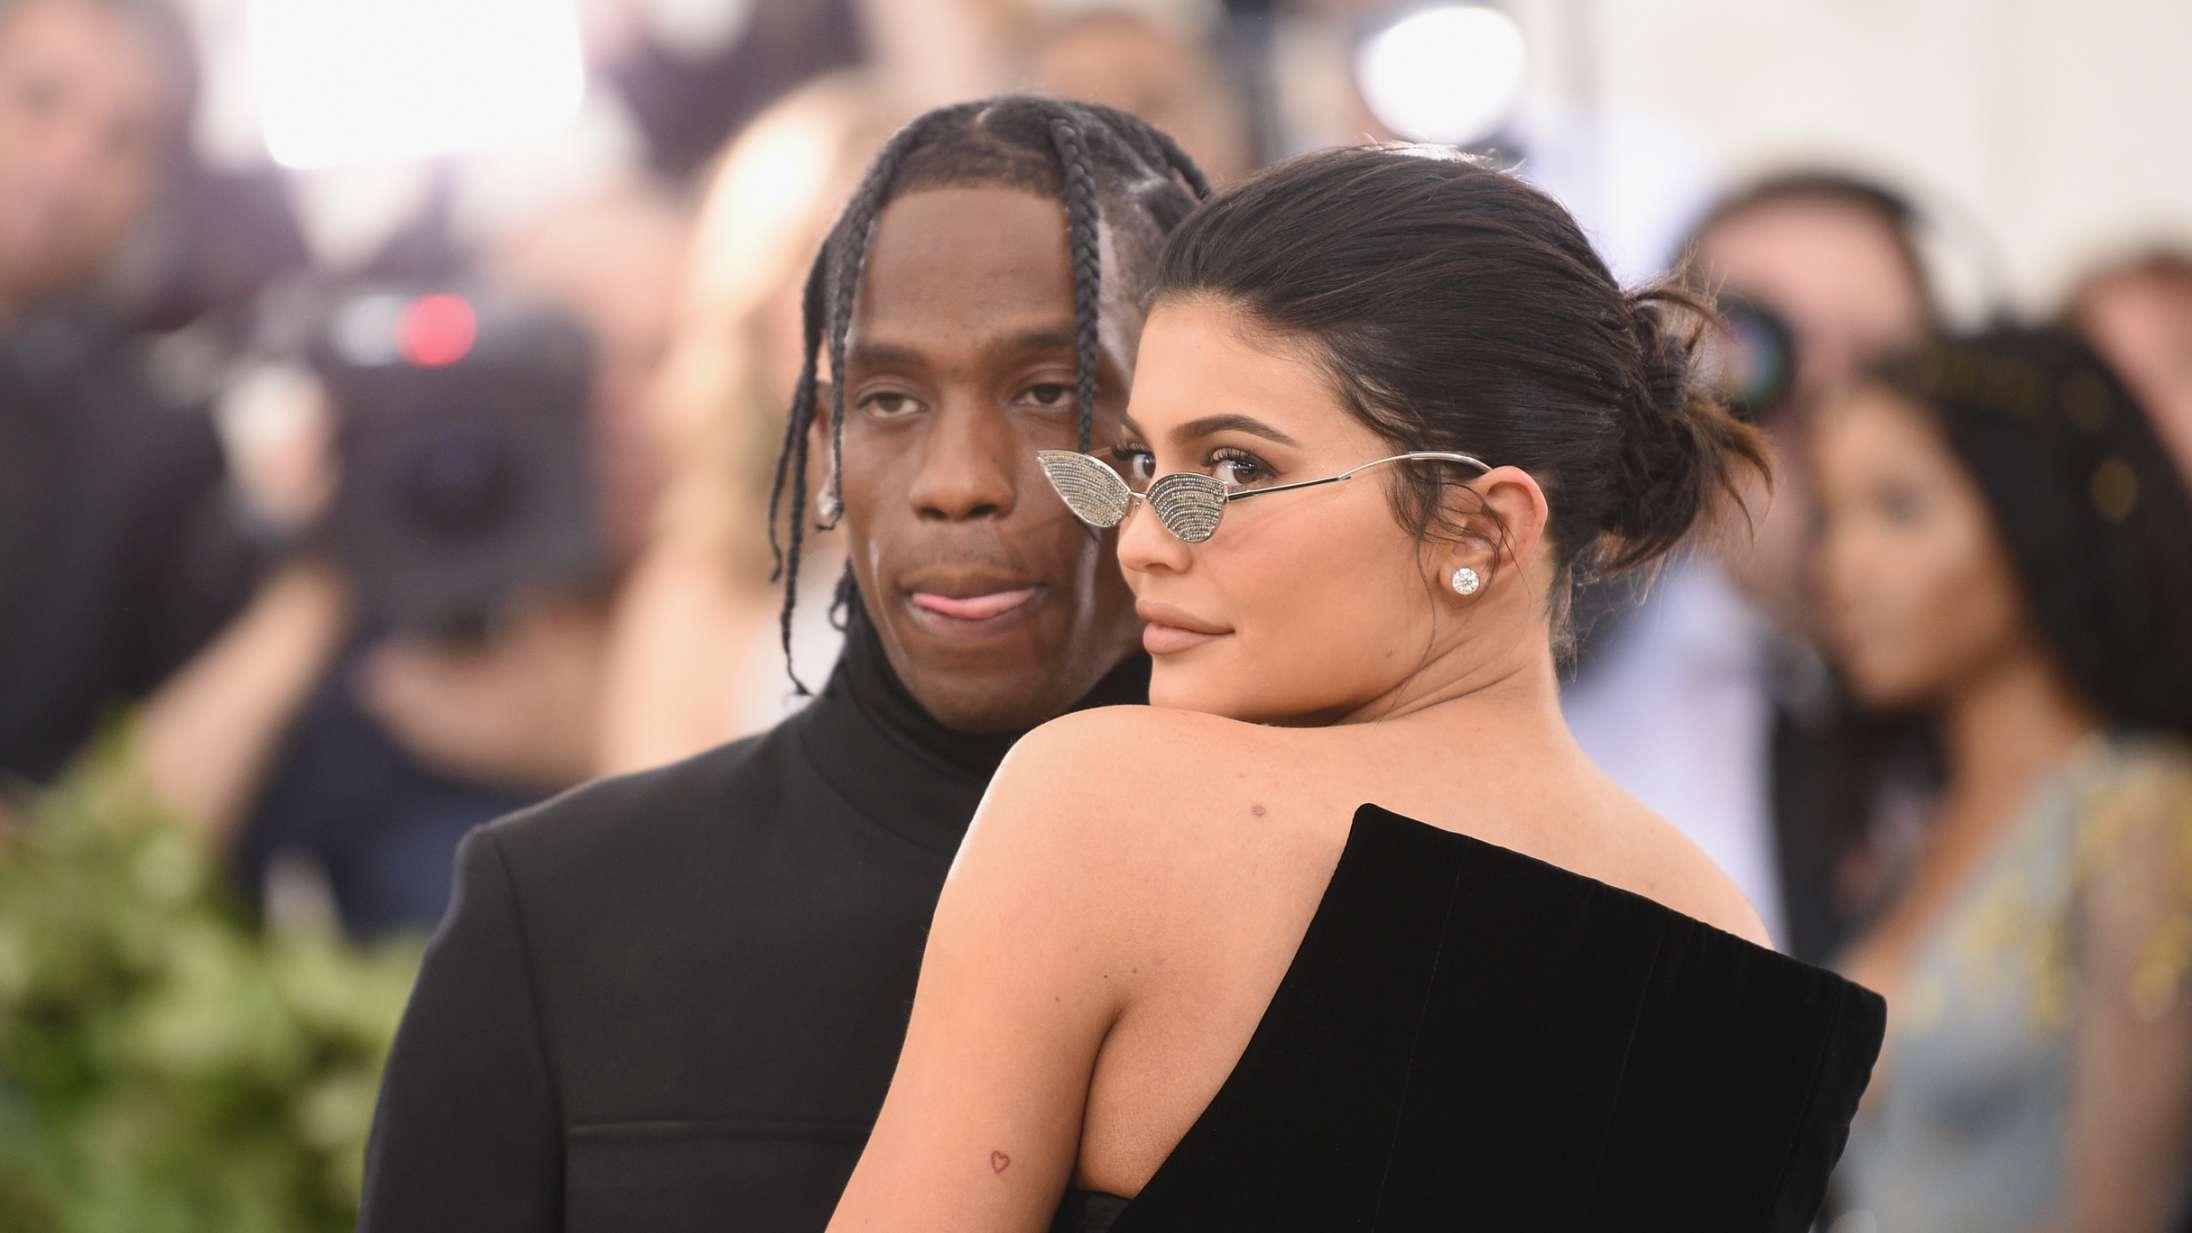 Efter Kimye-skilsmisse: Her er hiphoppens syv største power couples